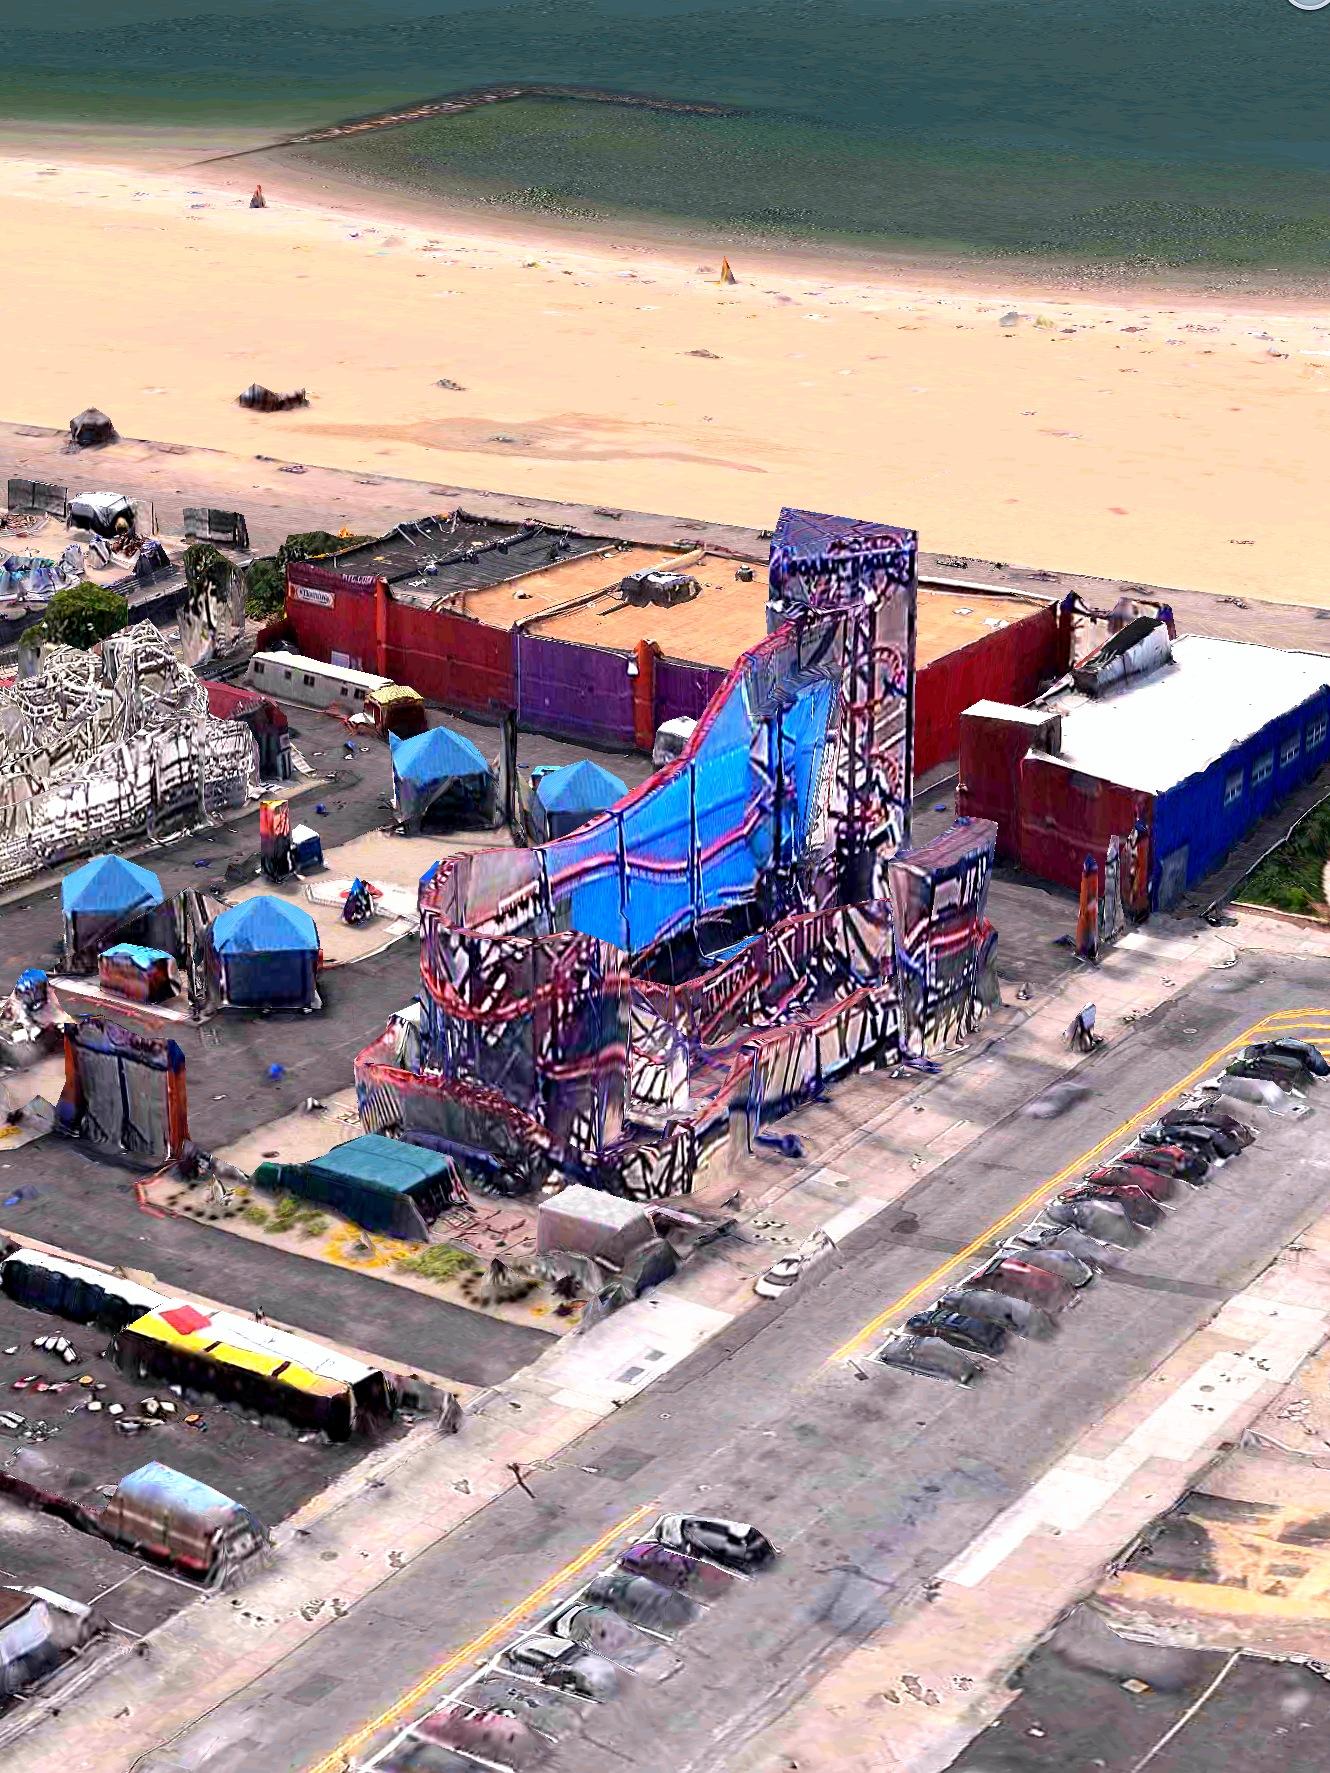 coney_island_rollercoaster_1.jpg